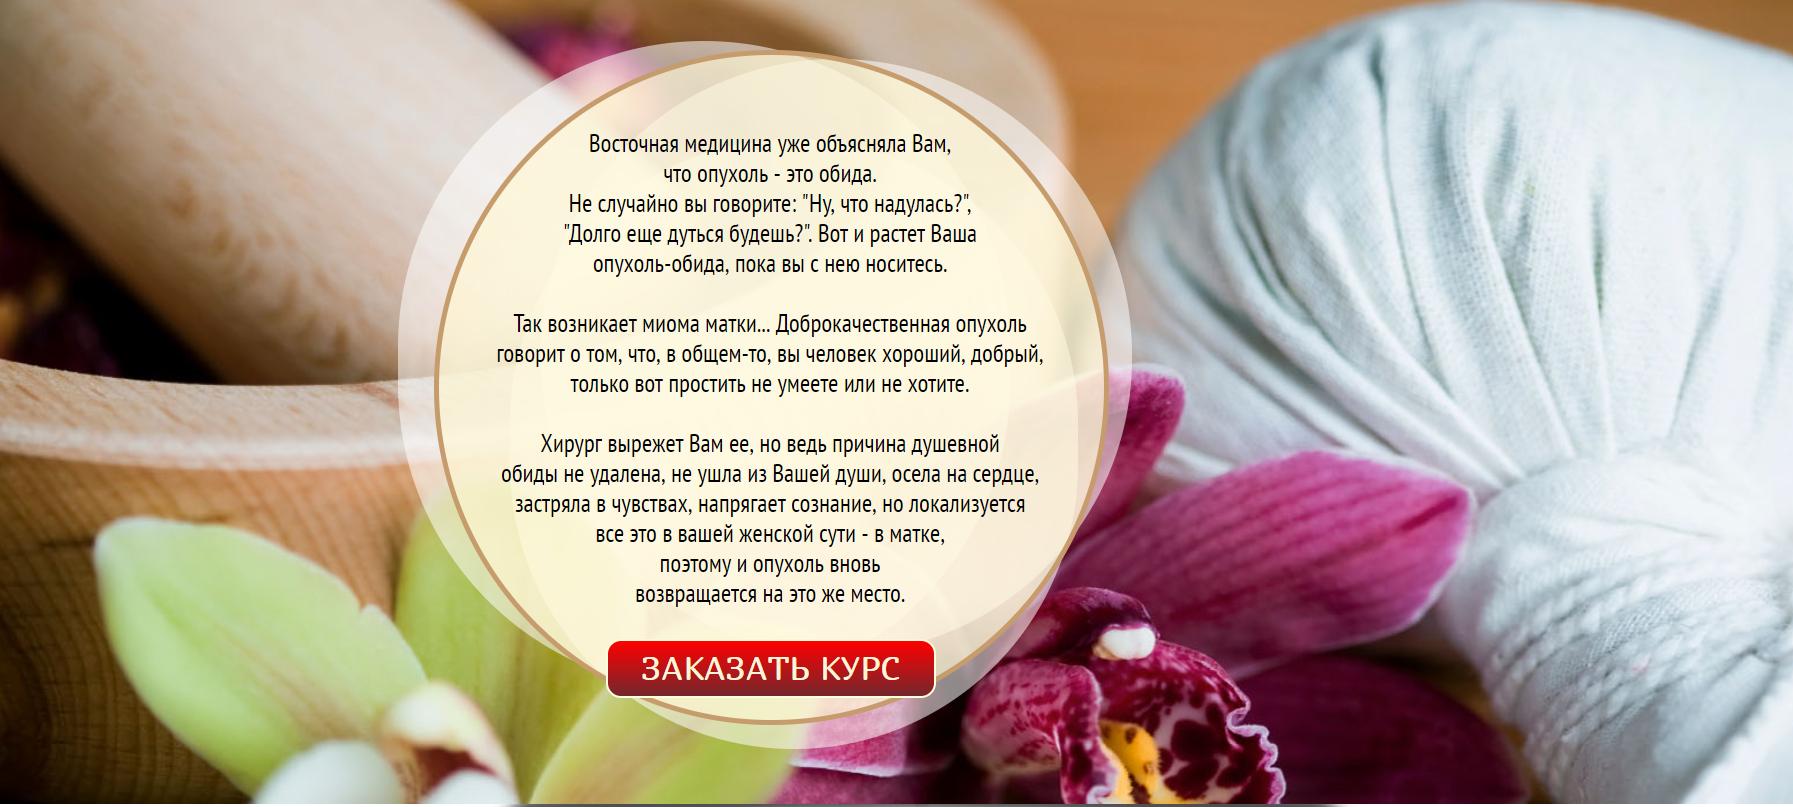 http://s5.uploads.ru/JCYzV.png